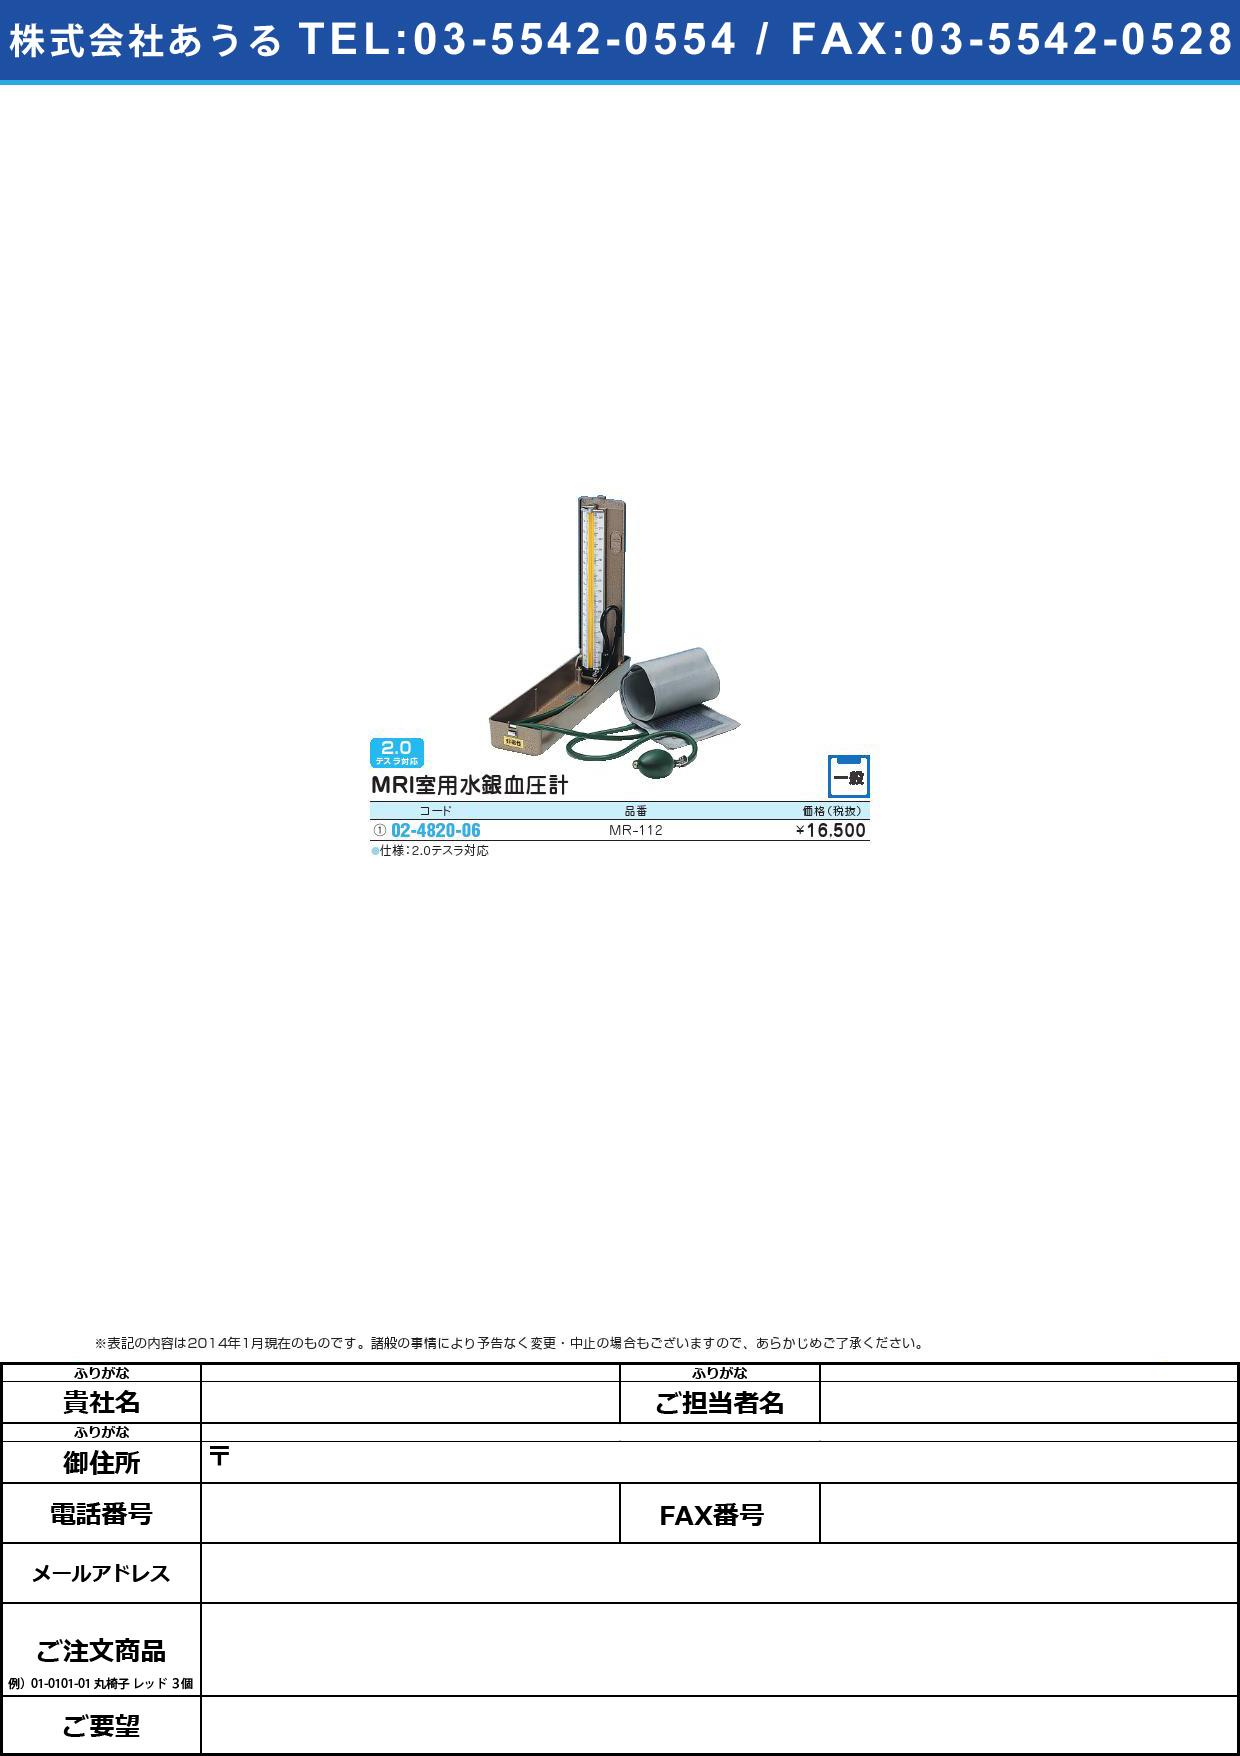 MRI室用卓上血圧計 MRIシツヨウタクジョウケツアツケイ MR-112【1台単位】(02-4820-06)